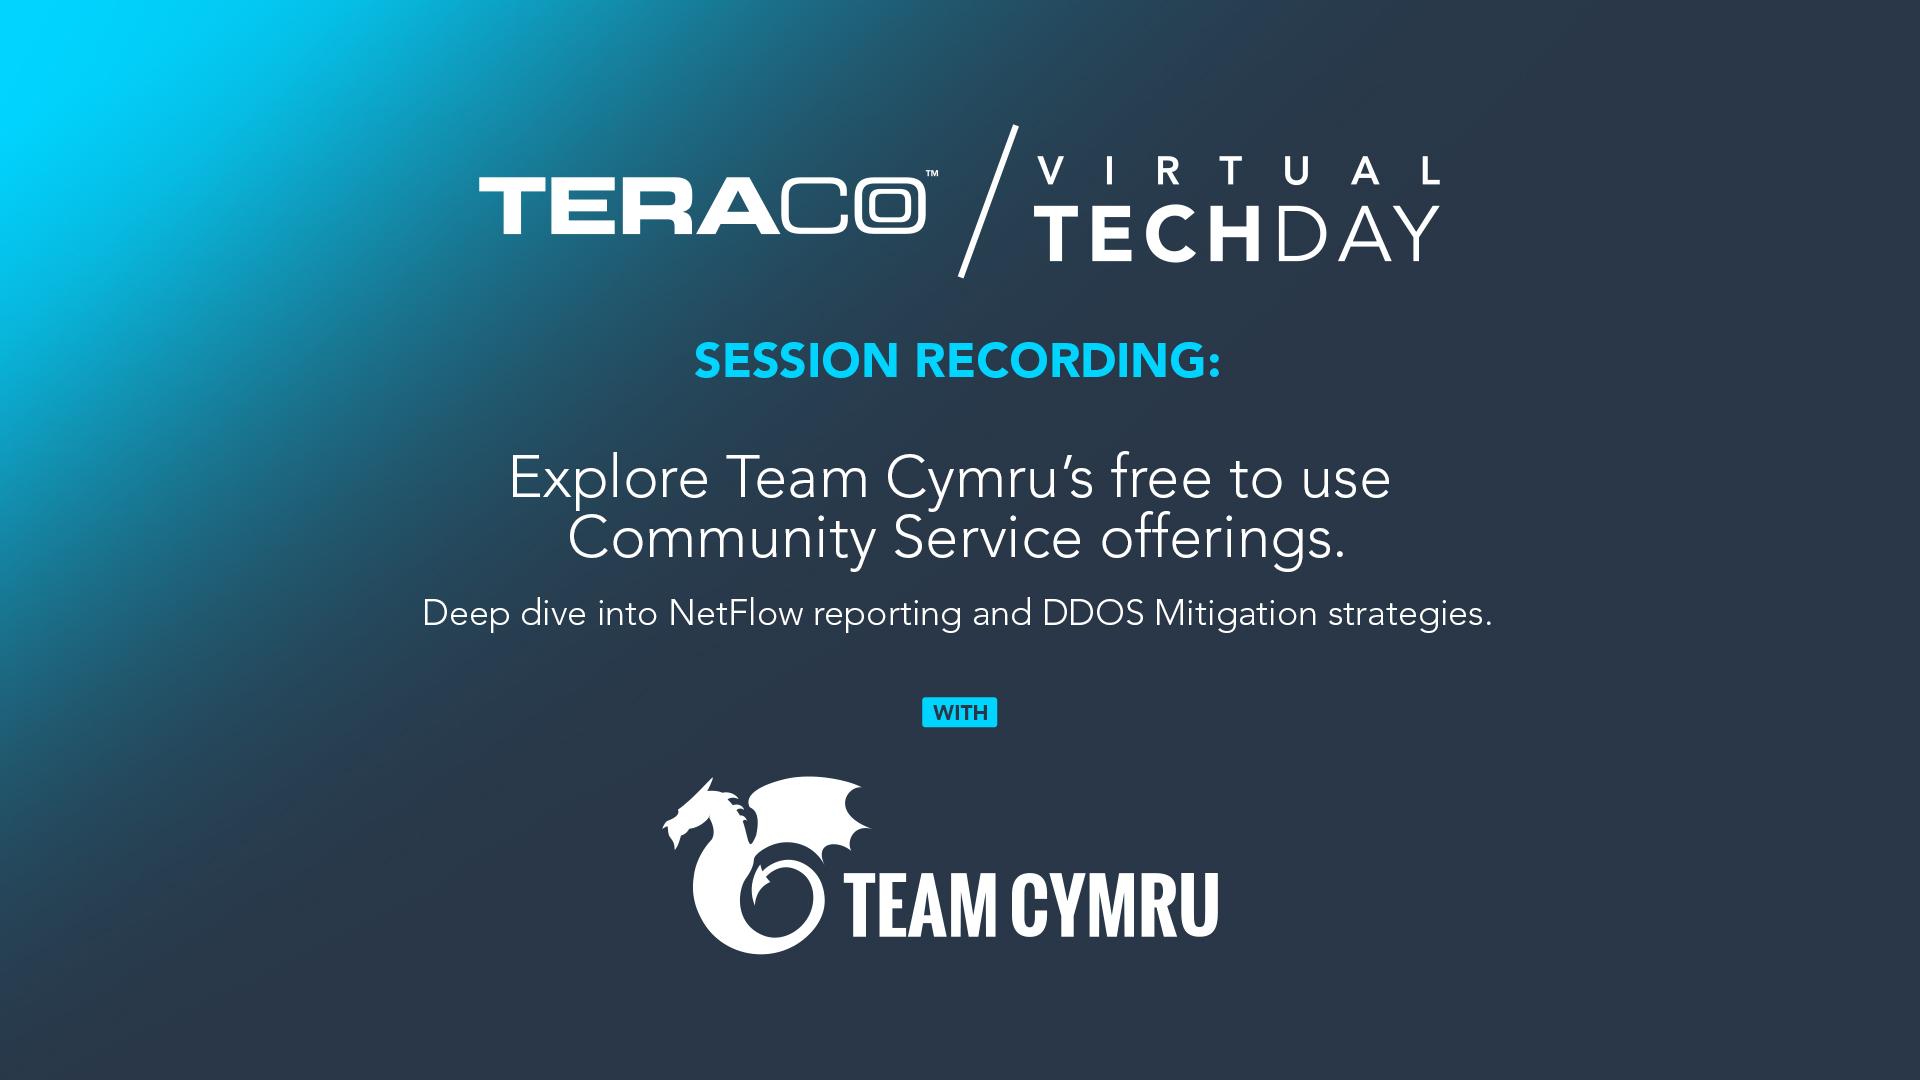 Teraco Tech Day | Team Cymru